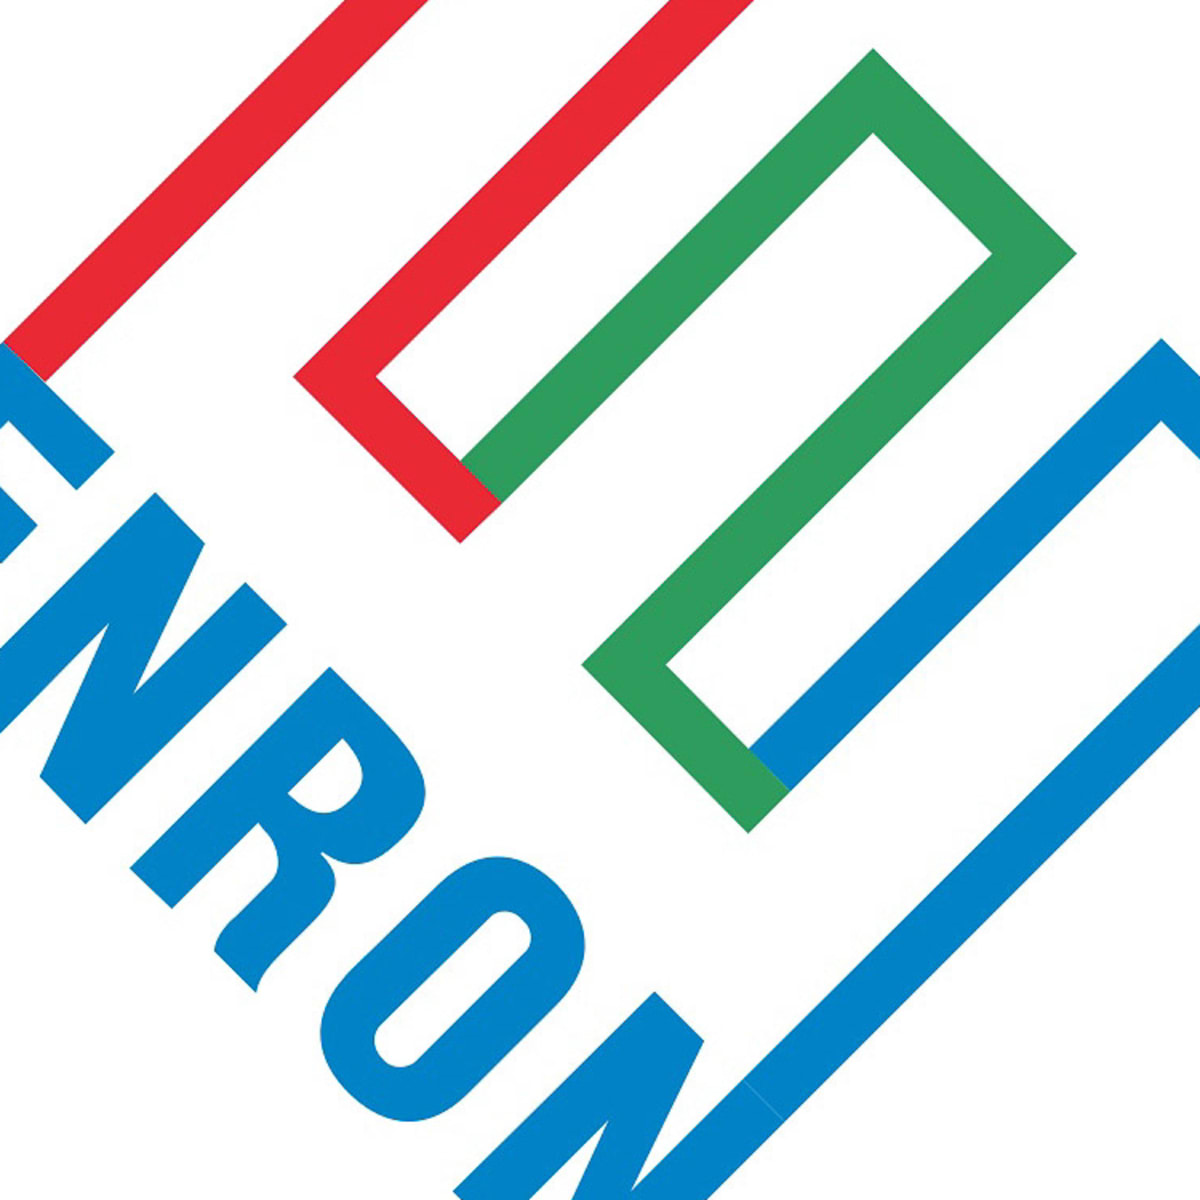 News_Carol Rust_Worst Events of Decade_Dec. 2009_Enron_logo_color